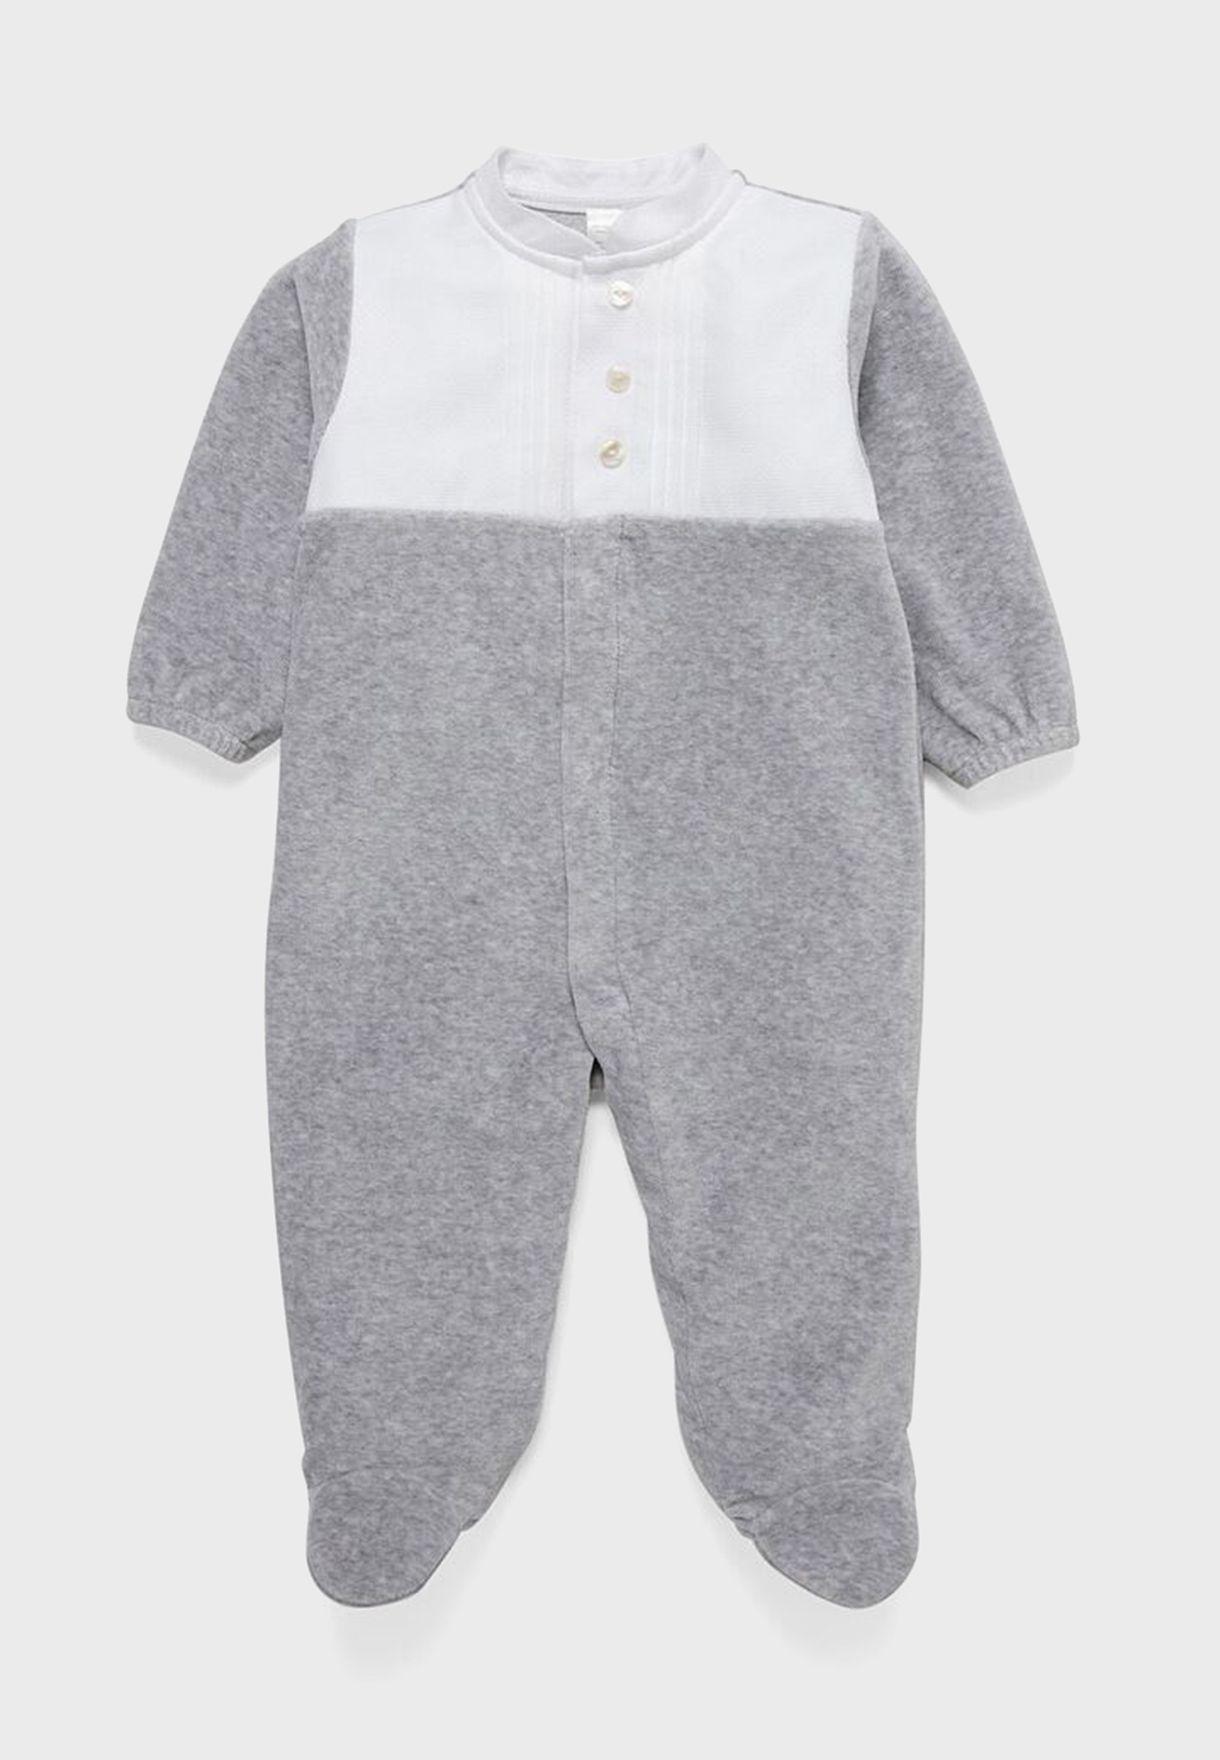 Infant Casual Romper